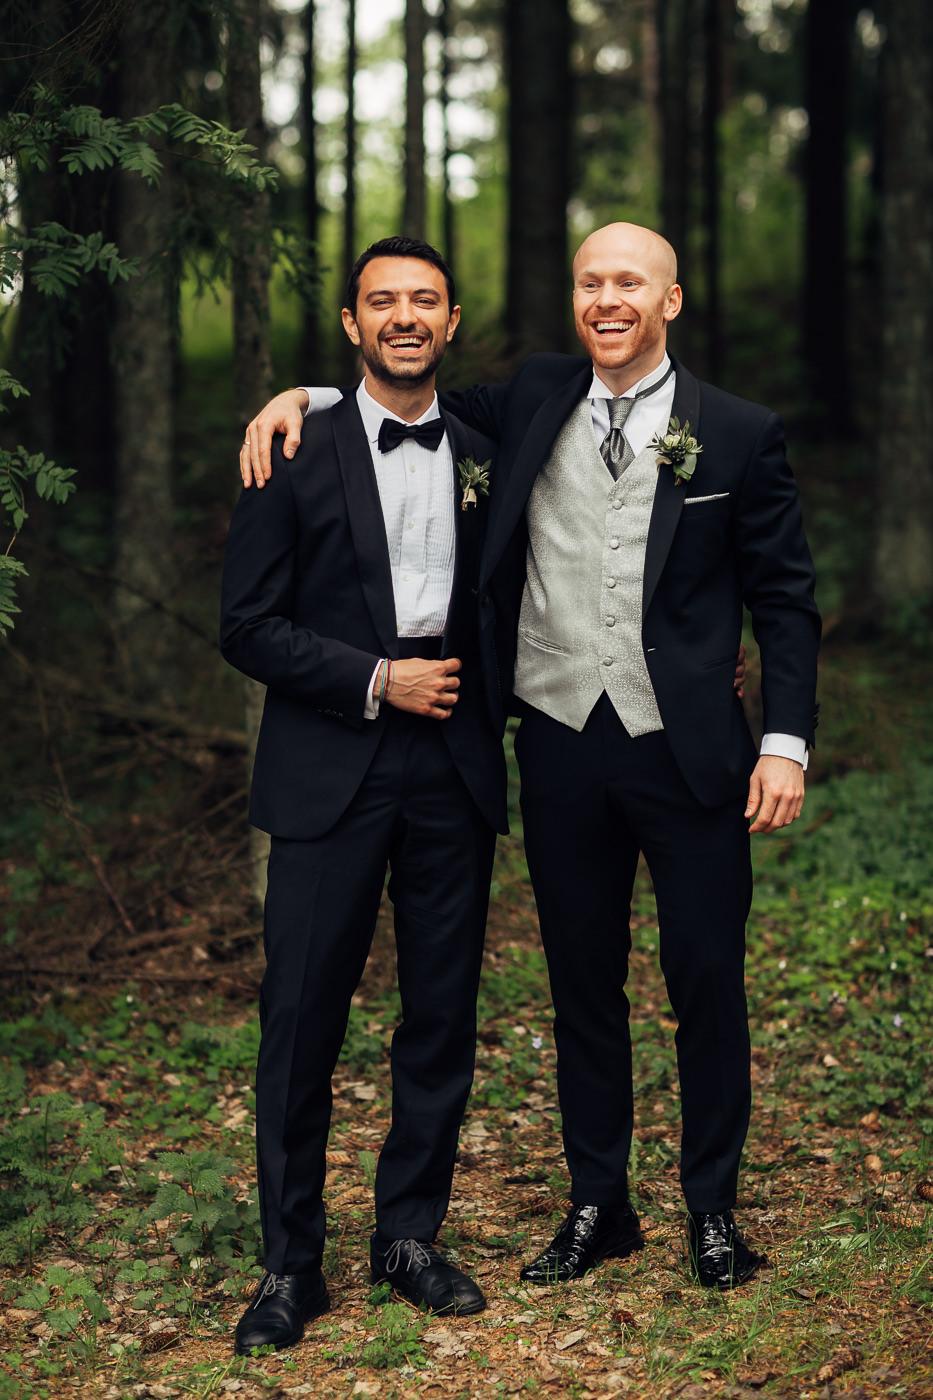 Malene & Ole Martin - elegant dansk- norskt bryllup i Oslo Bryllup Gamle Aker Oslo 34 Akershus